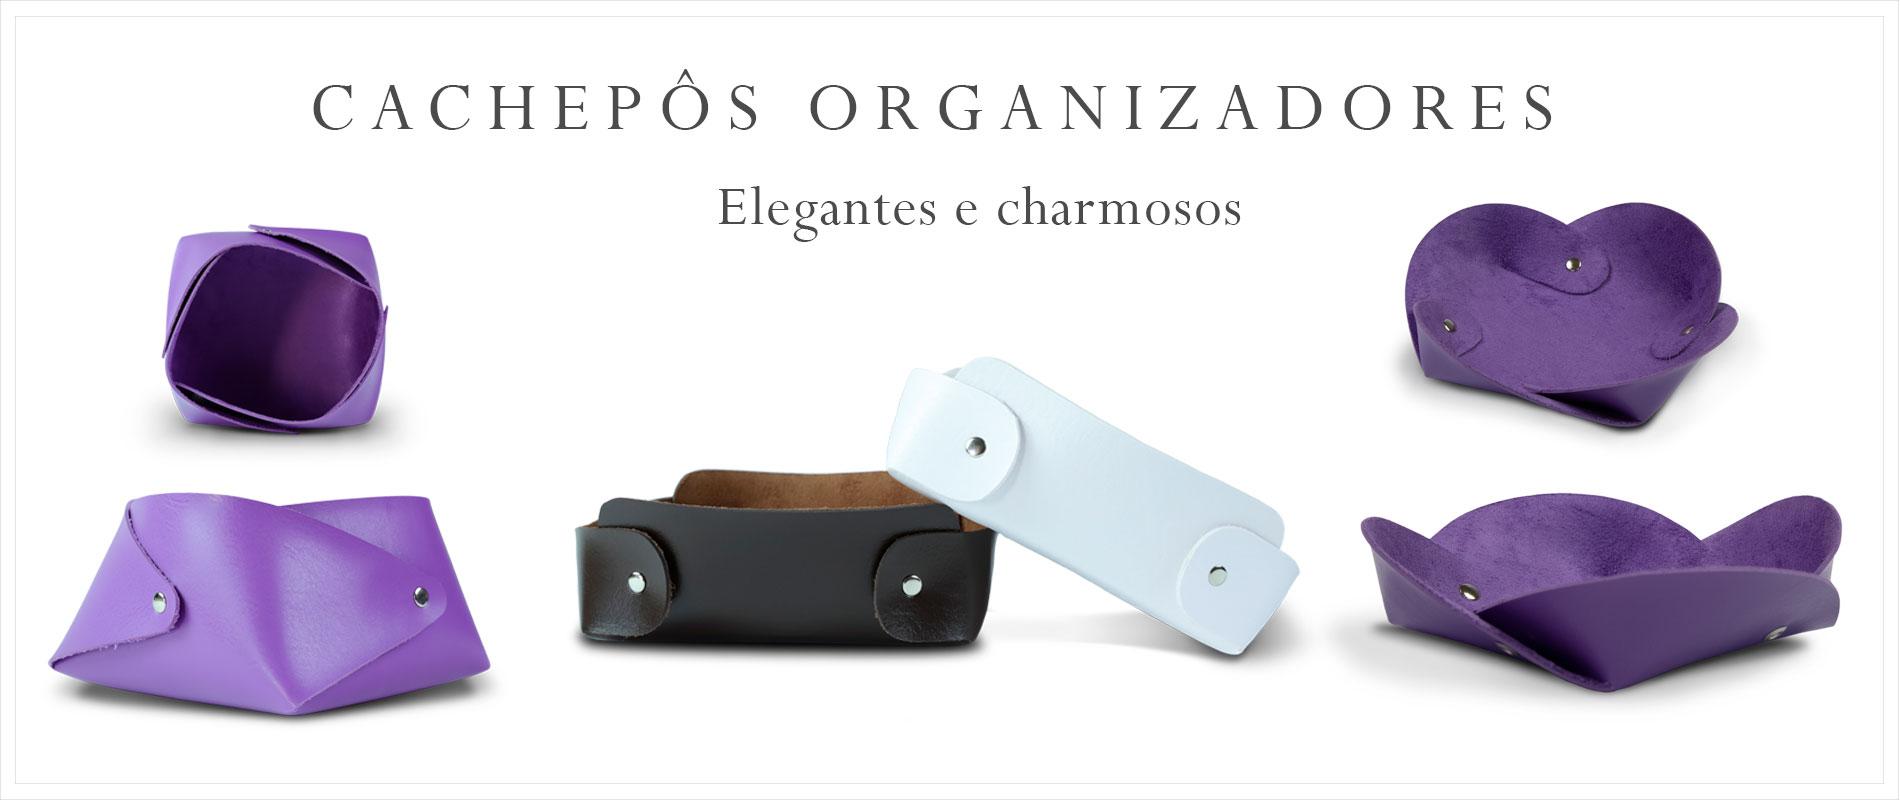 catalog/Banner/CACHEPO.jpg